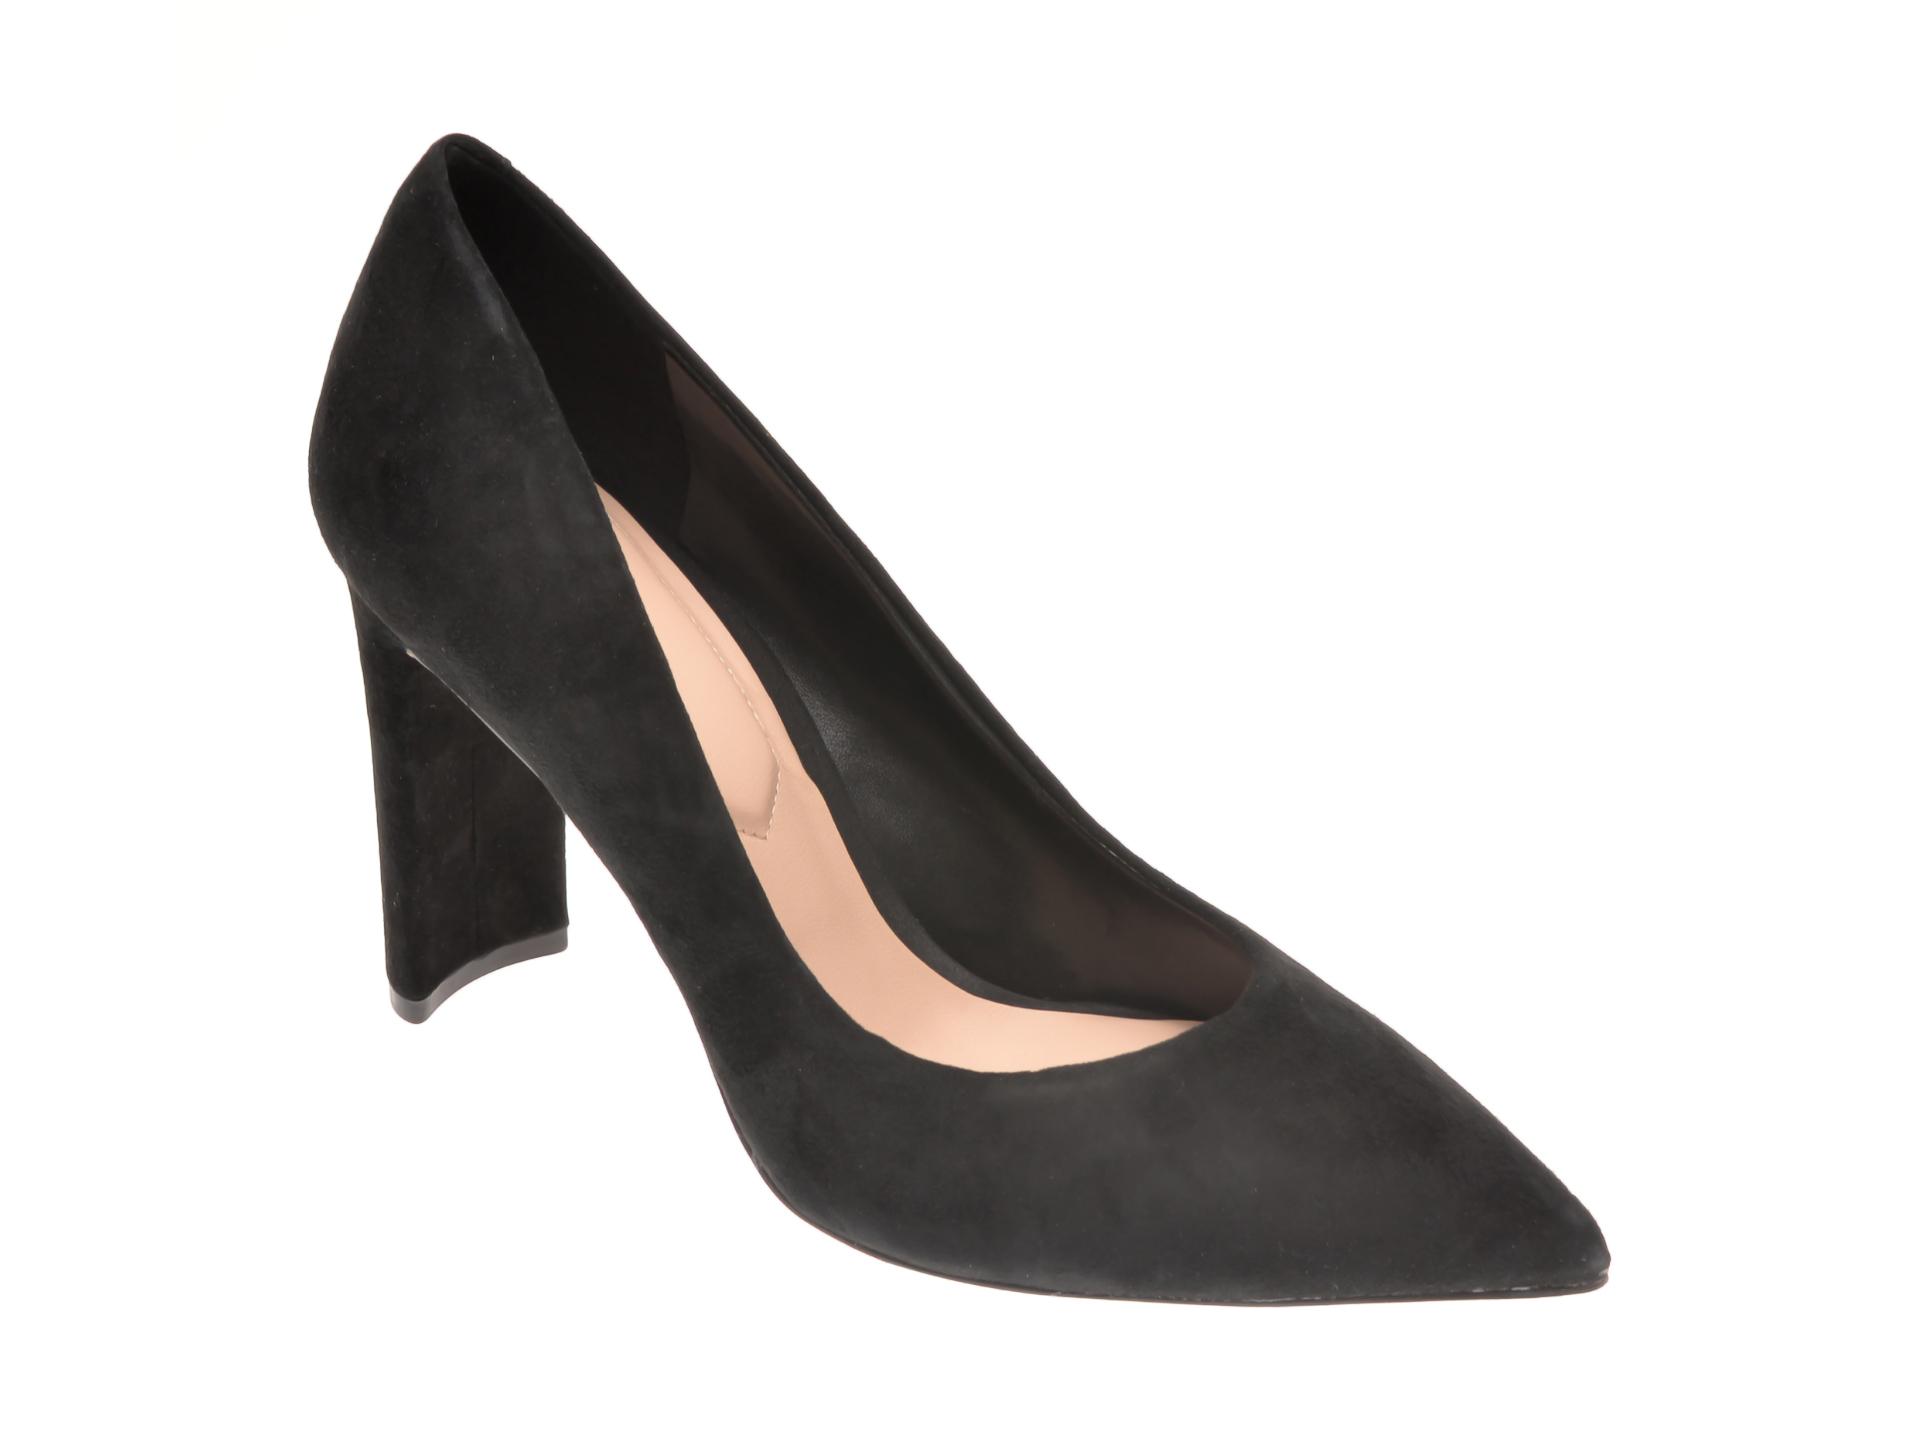 Pantofi ALDO negri, Febriclya001, din piele intoarsa imagine otter.ro 2021